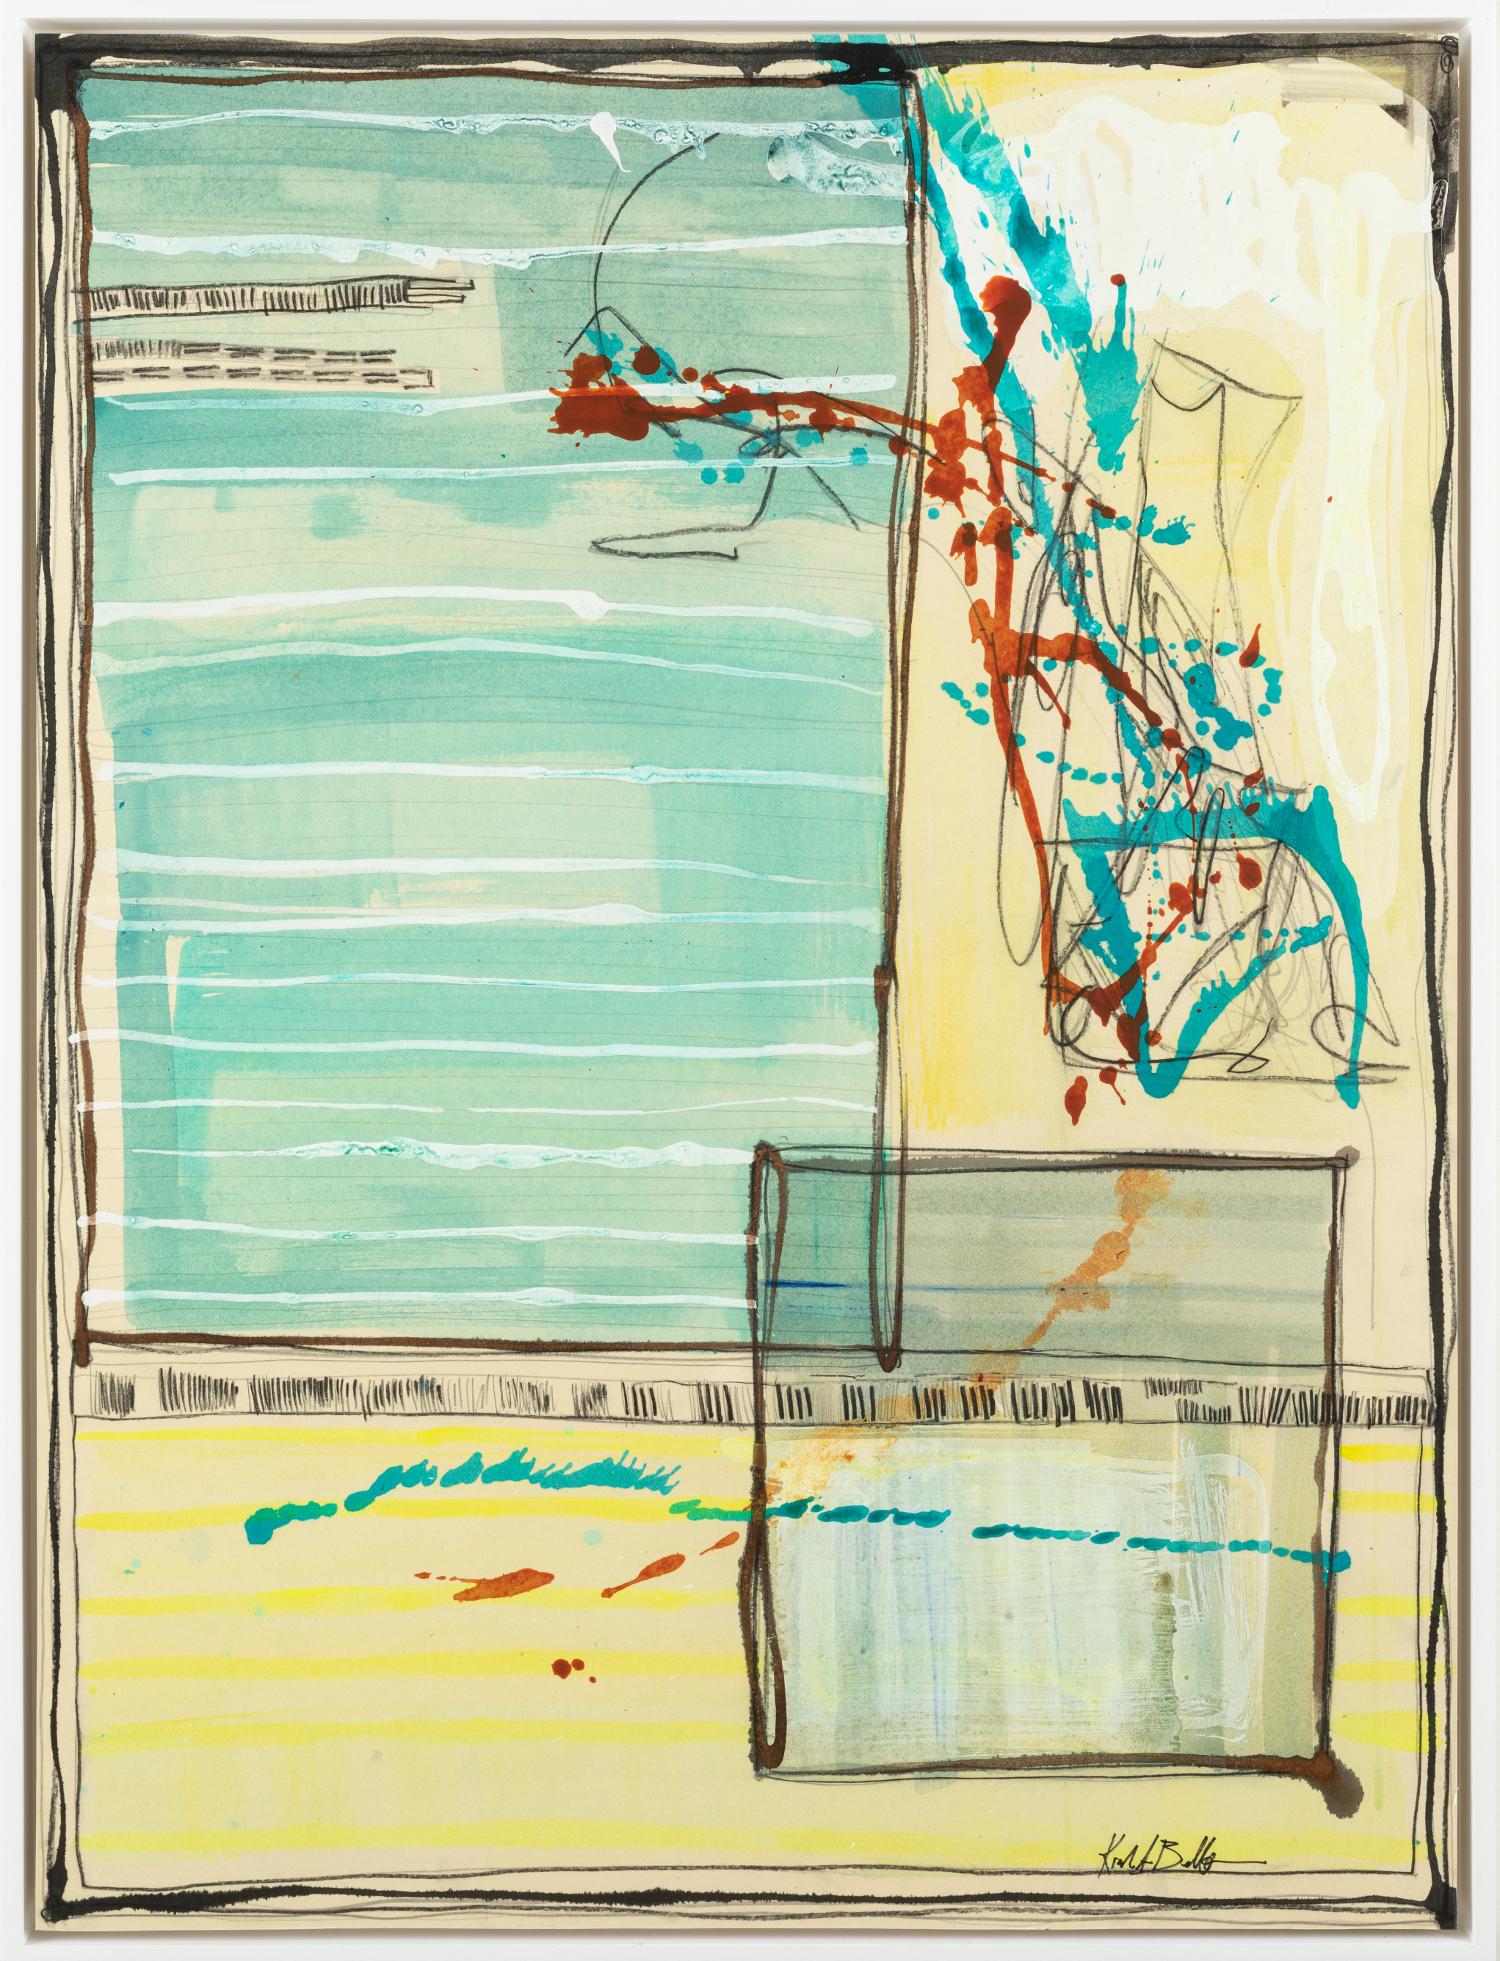 "Memories of Home III - Kiah Bellows31.5"" x 41.5"" Mixed media on board, framed$1100"